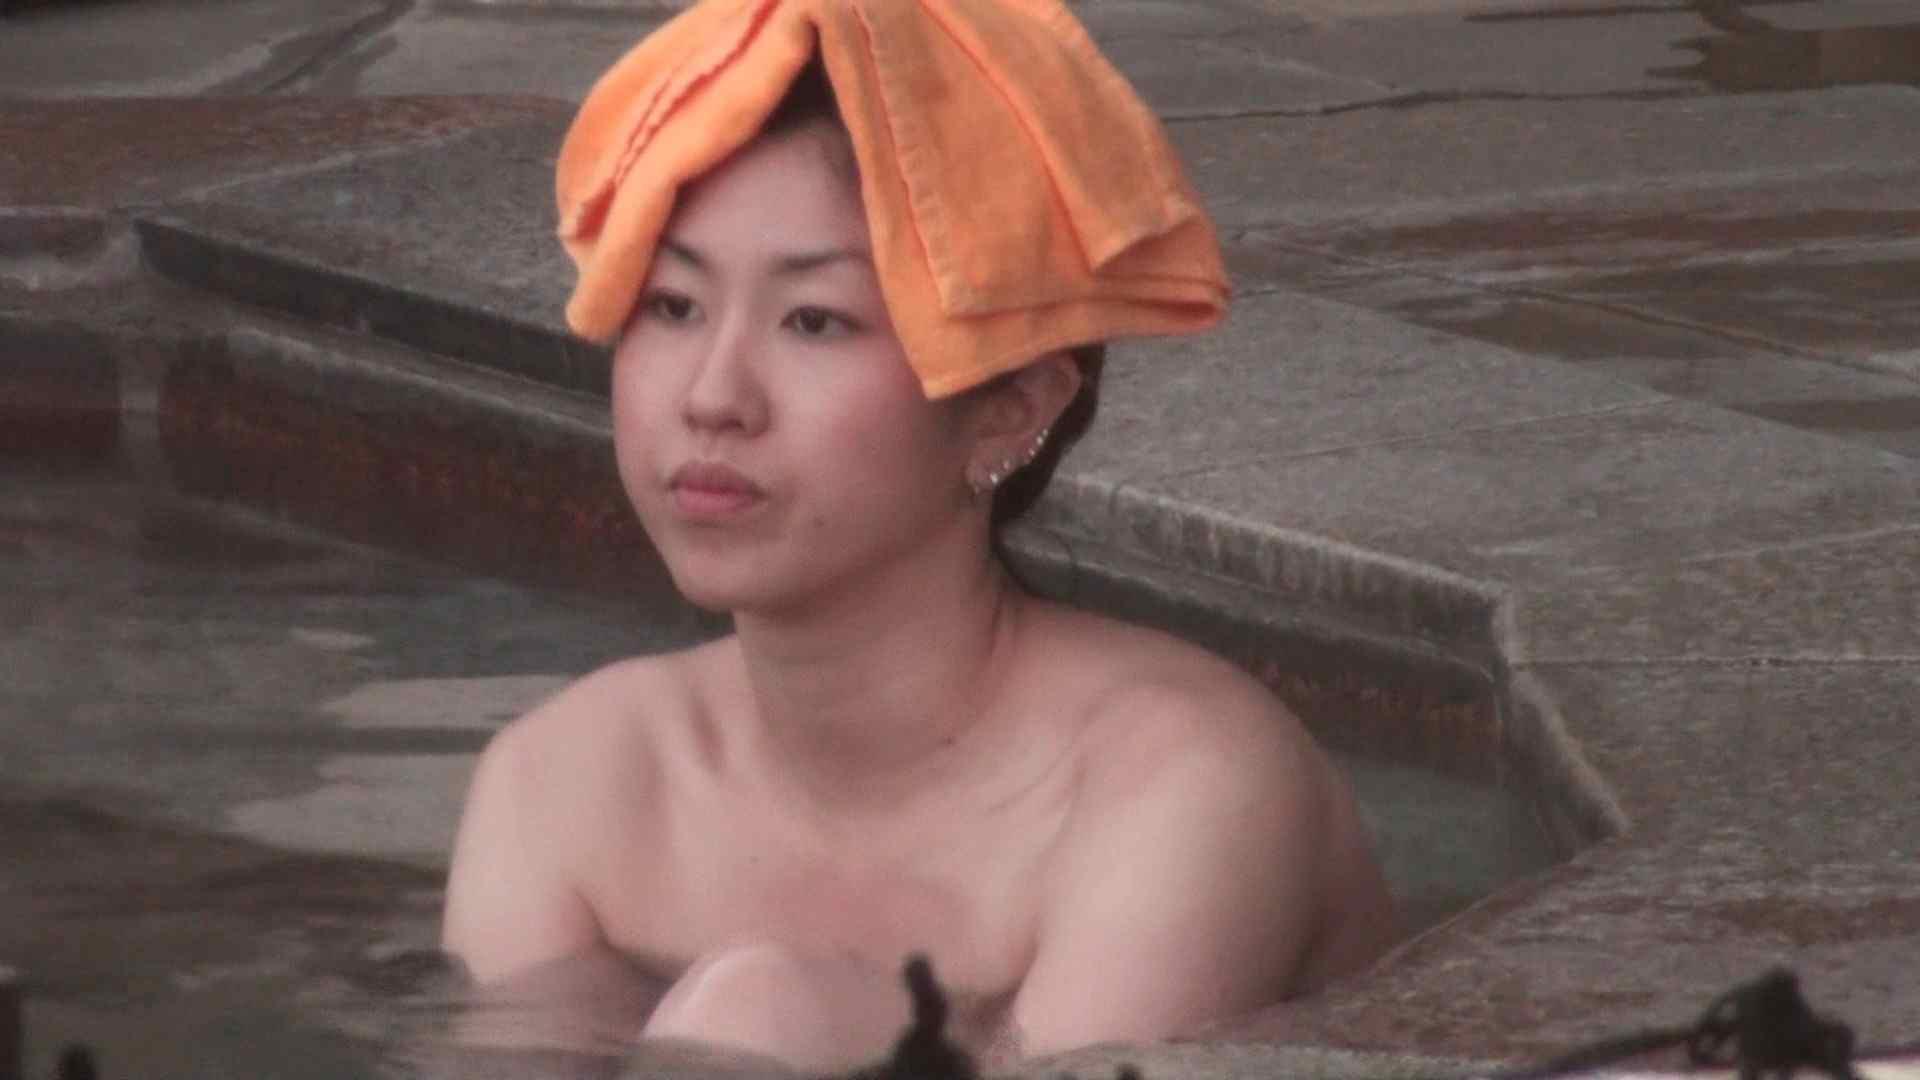 Aquaな露天風呂Vol.135 盗撮シリーズ | 露天風呂編  84PIX 81